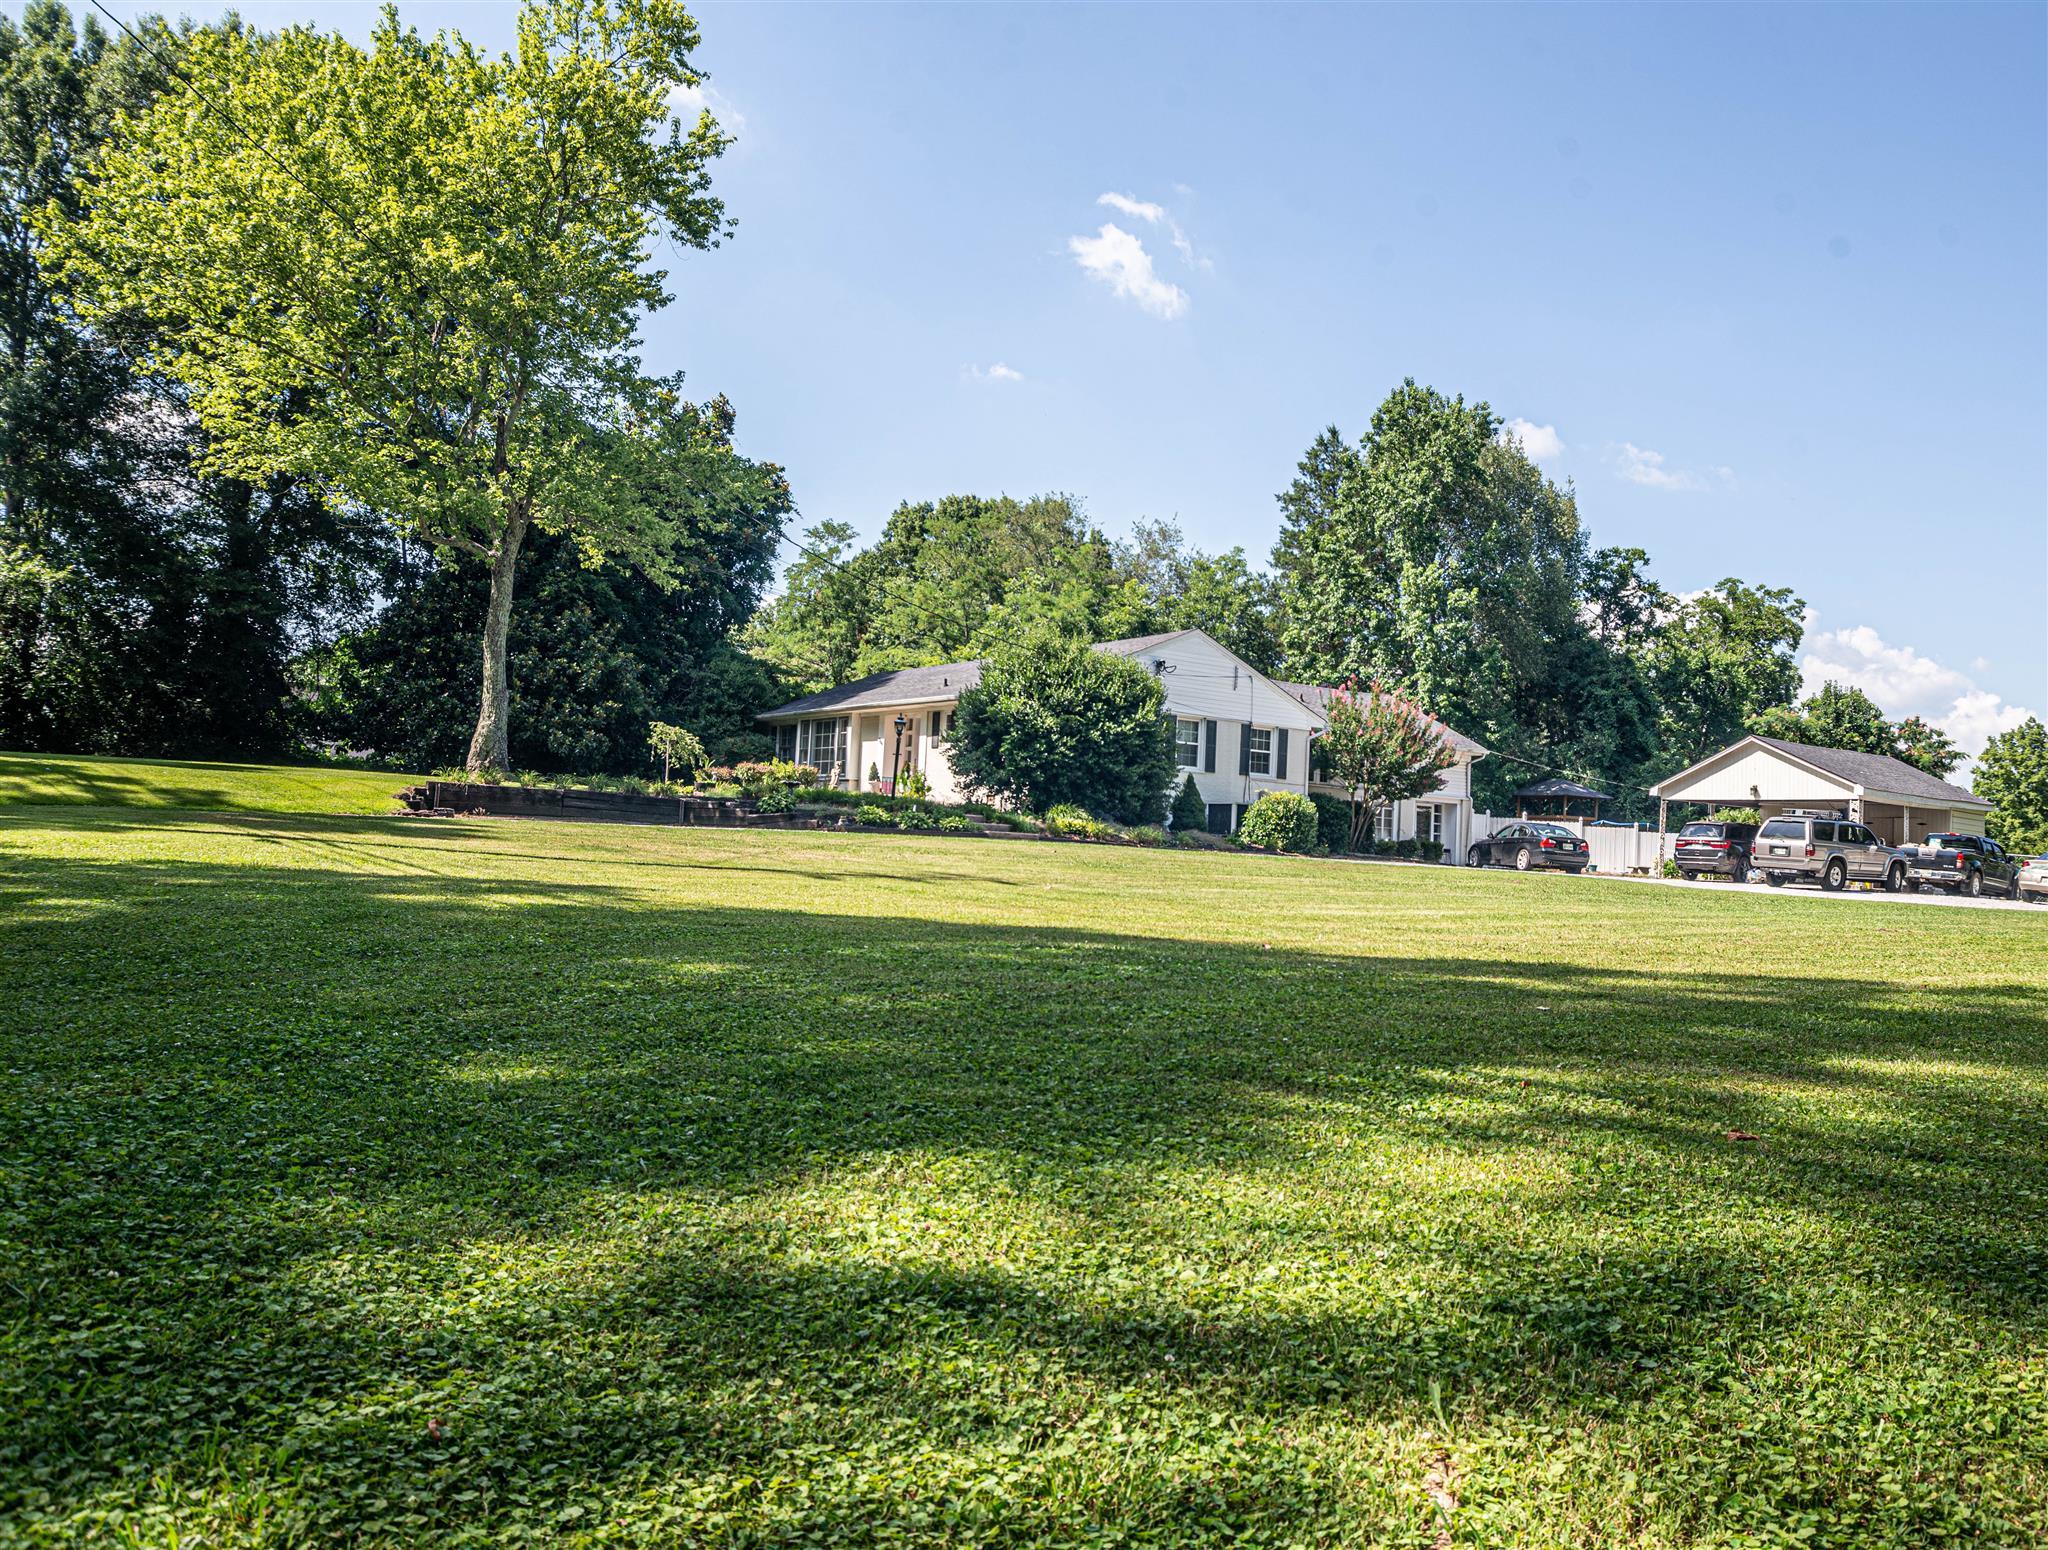 704 Cedar Ln, Tullahoma, TN 37388 - Tullahoma, TN real estate listing